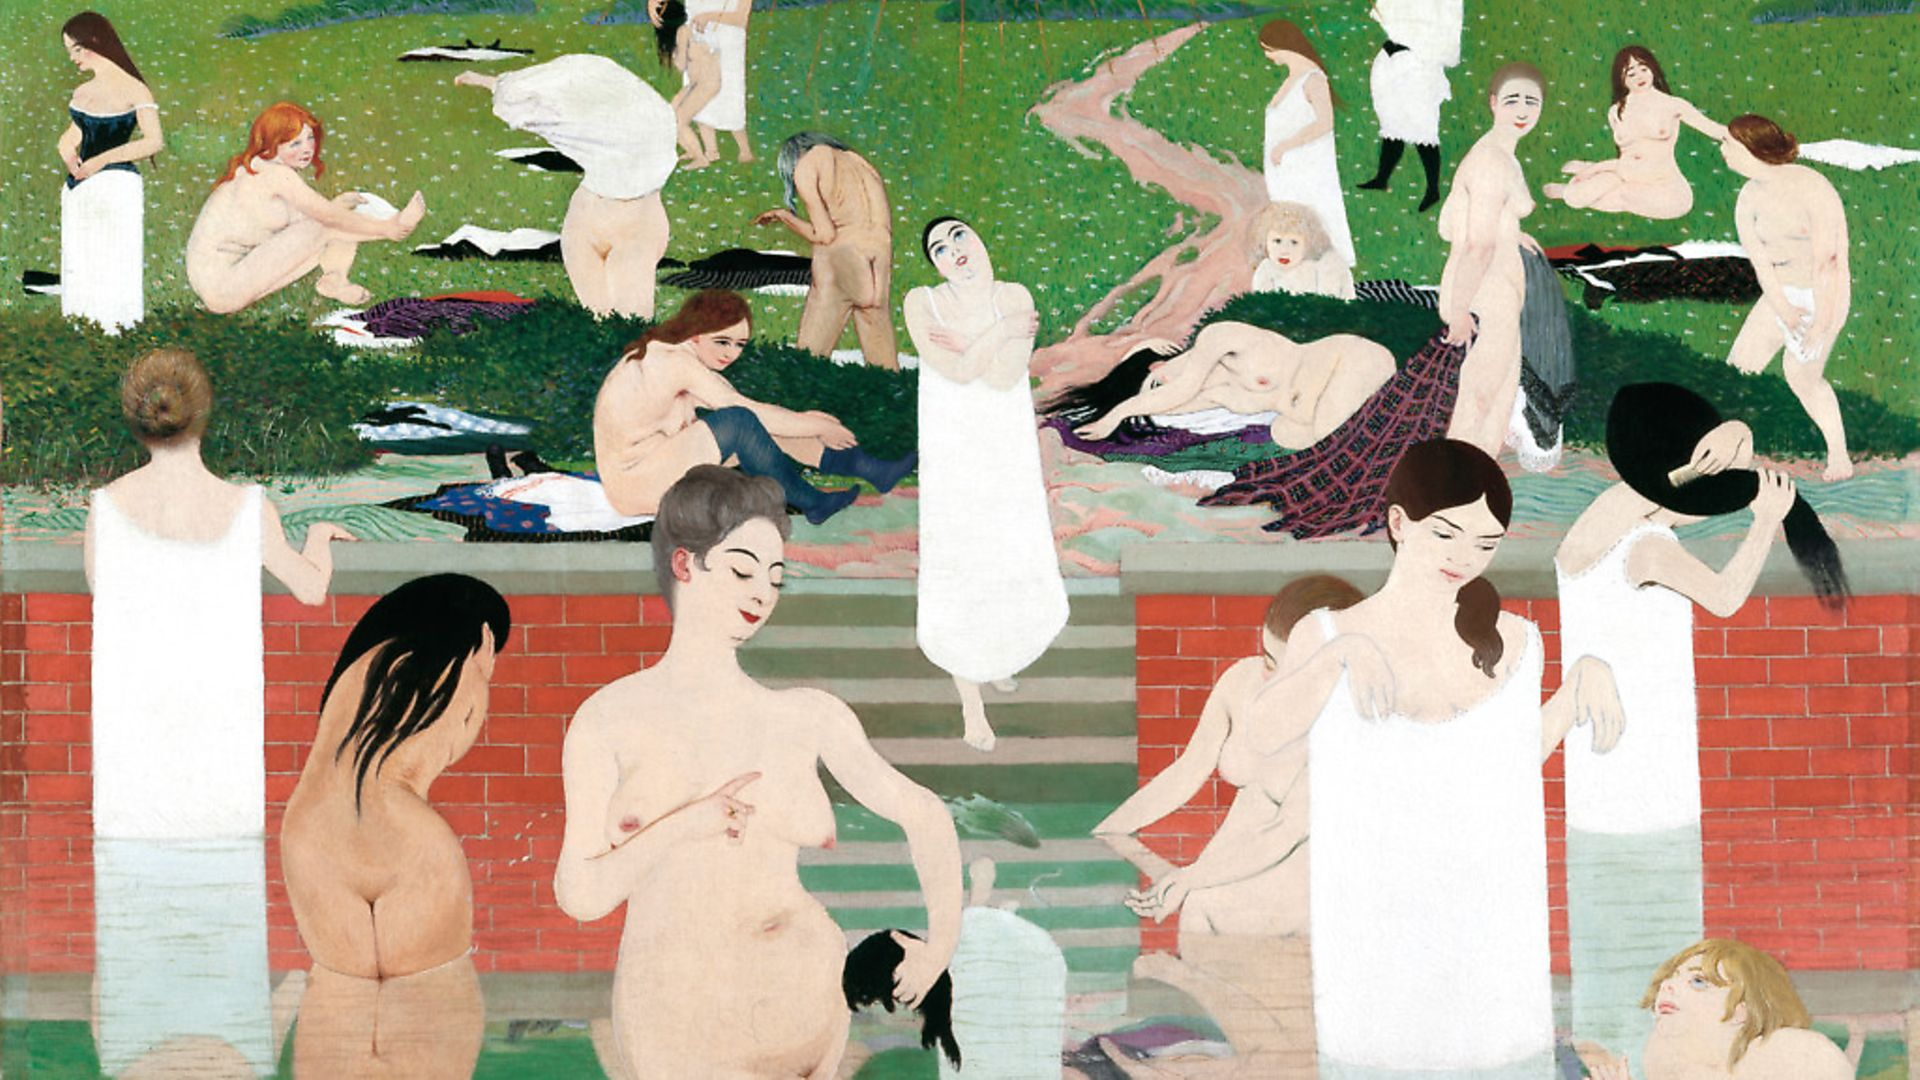 Bathing on a Summer Evening  1892-93. Oil on canvas, 97 x 131 cm. Credit: Kunsthaus Zurich. Kunsthaus Zurich - Credit: Archant